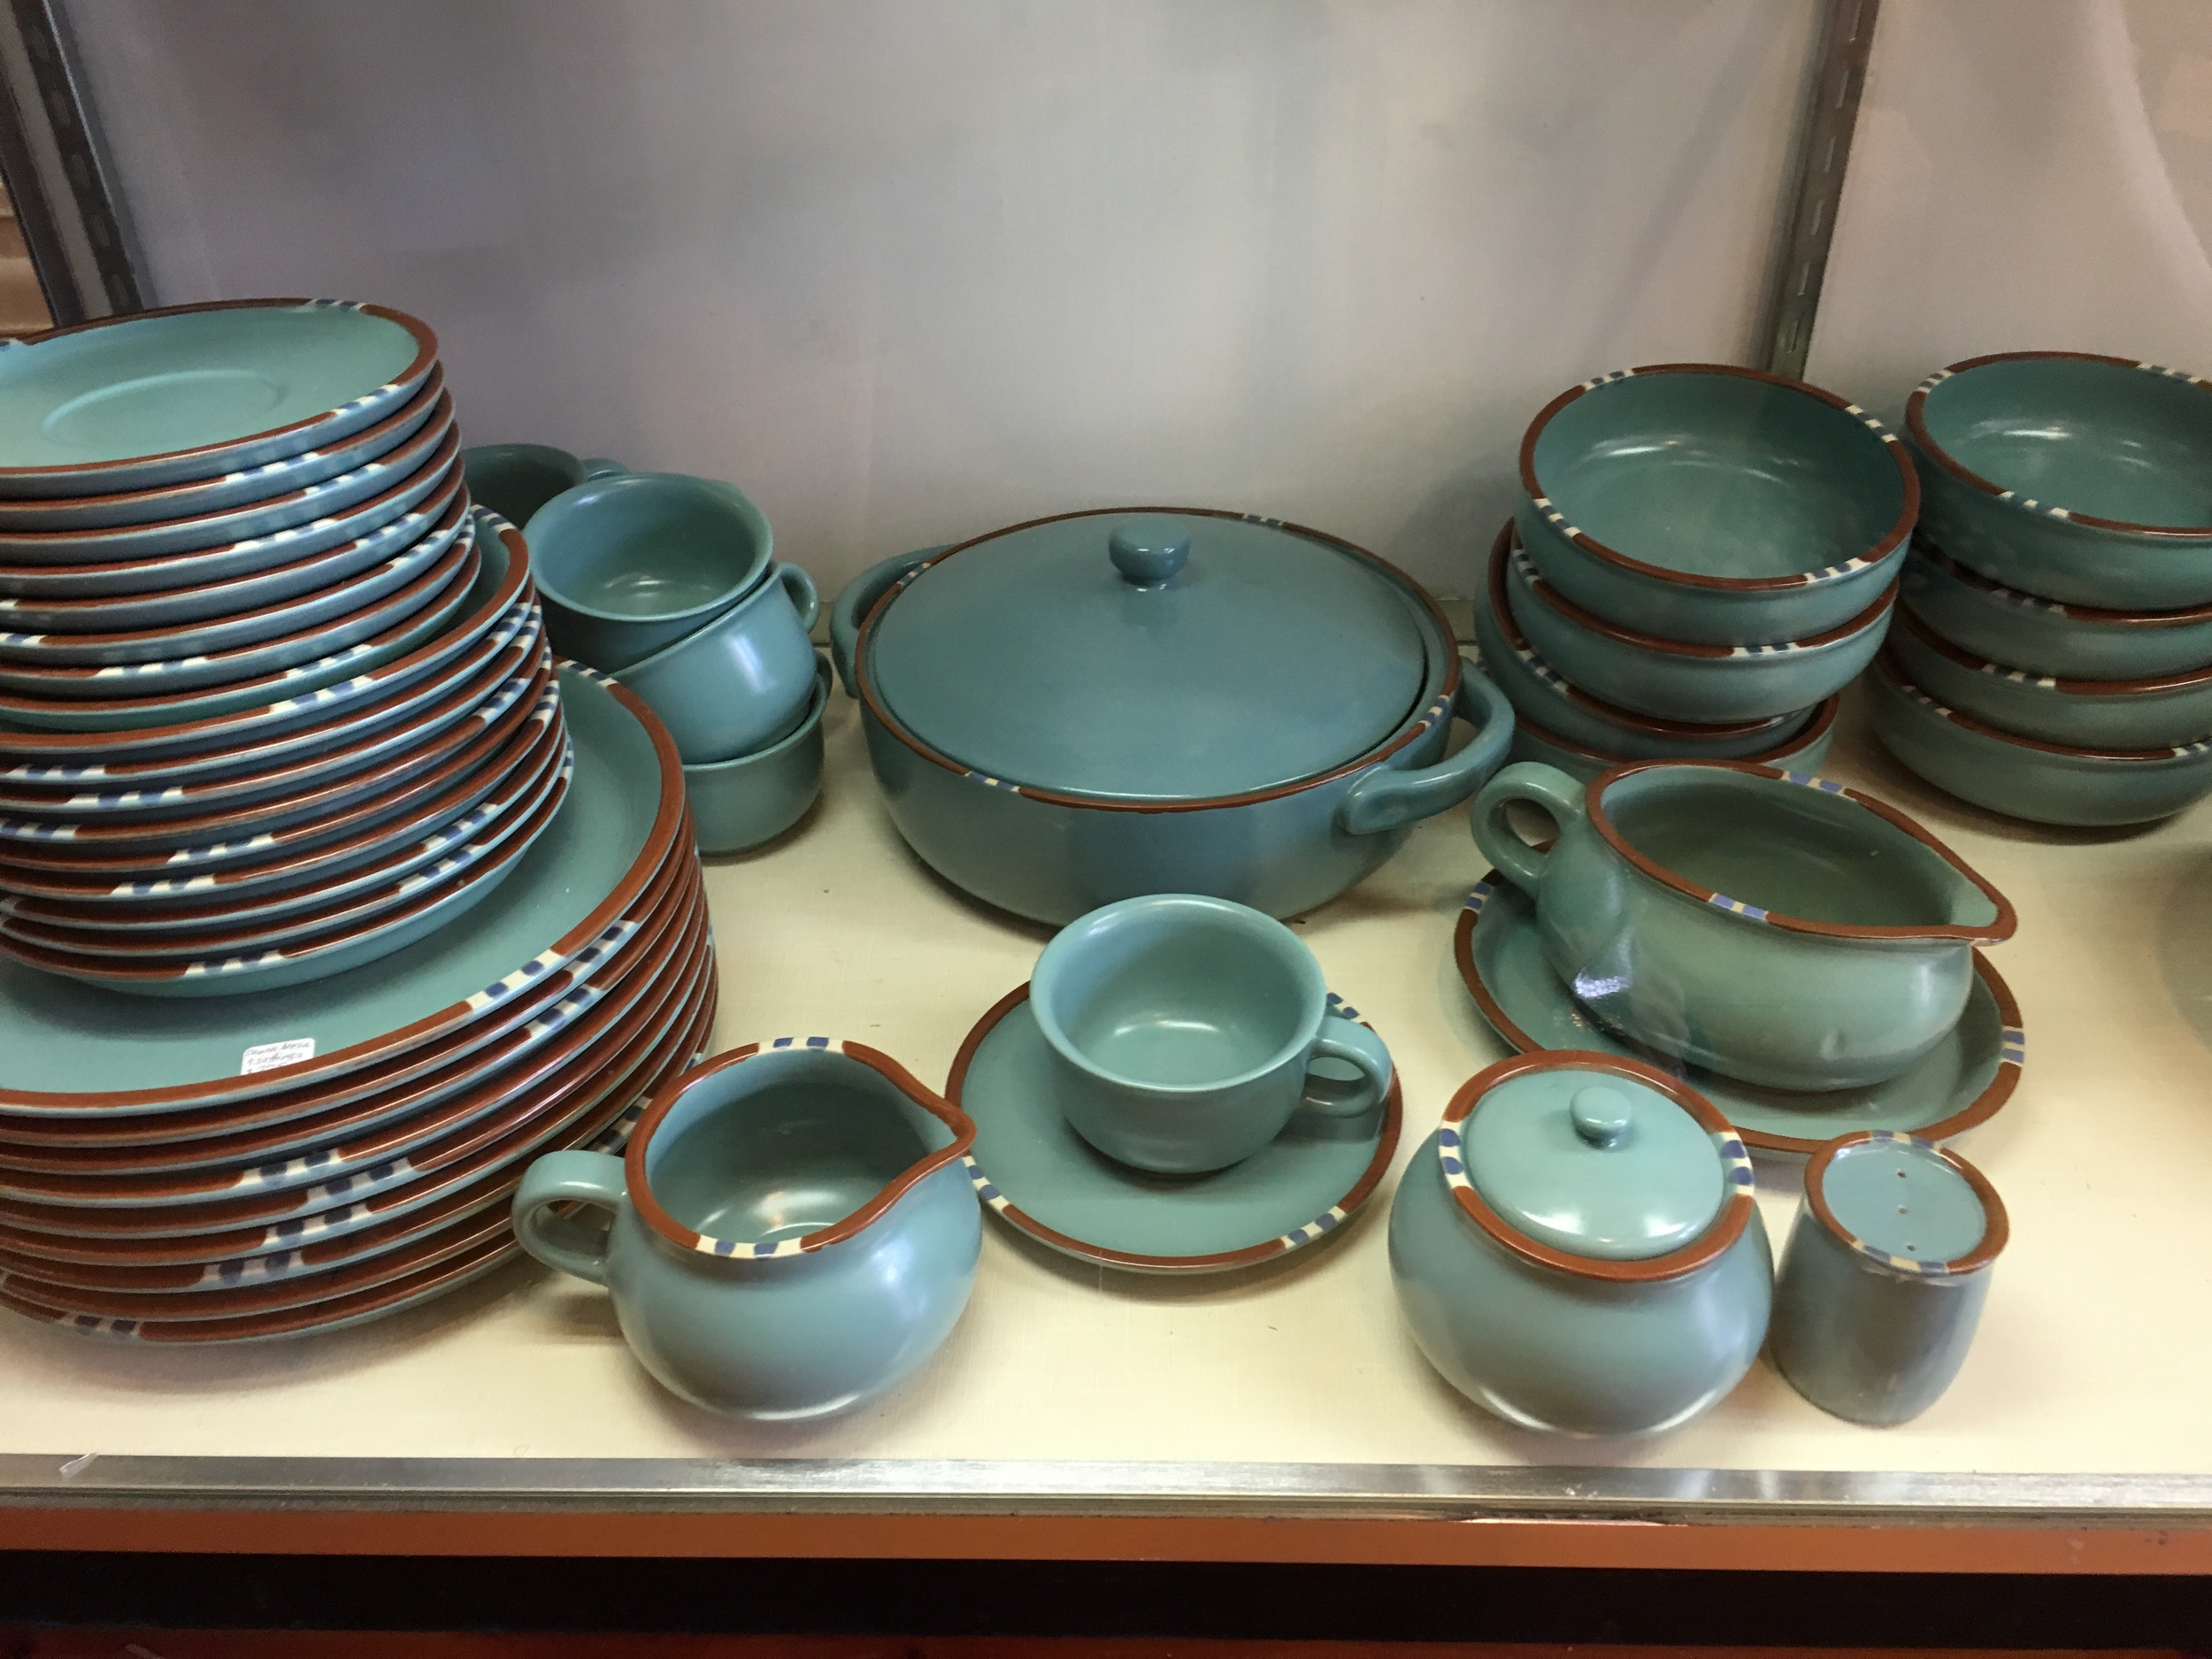 One find - Dansk Mesa dinnerware set in turquoise